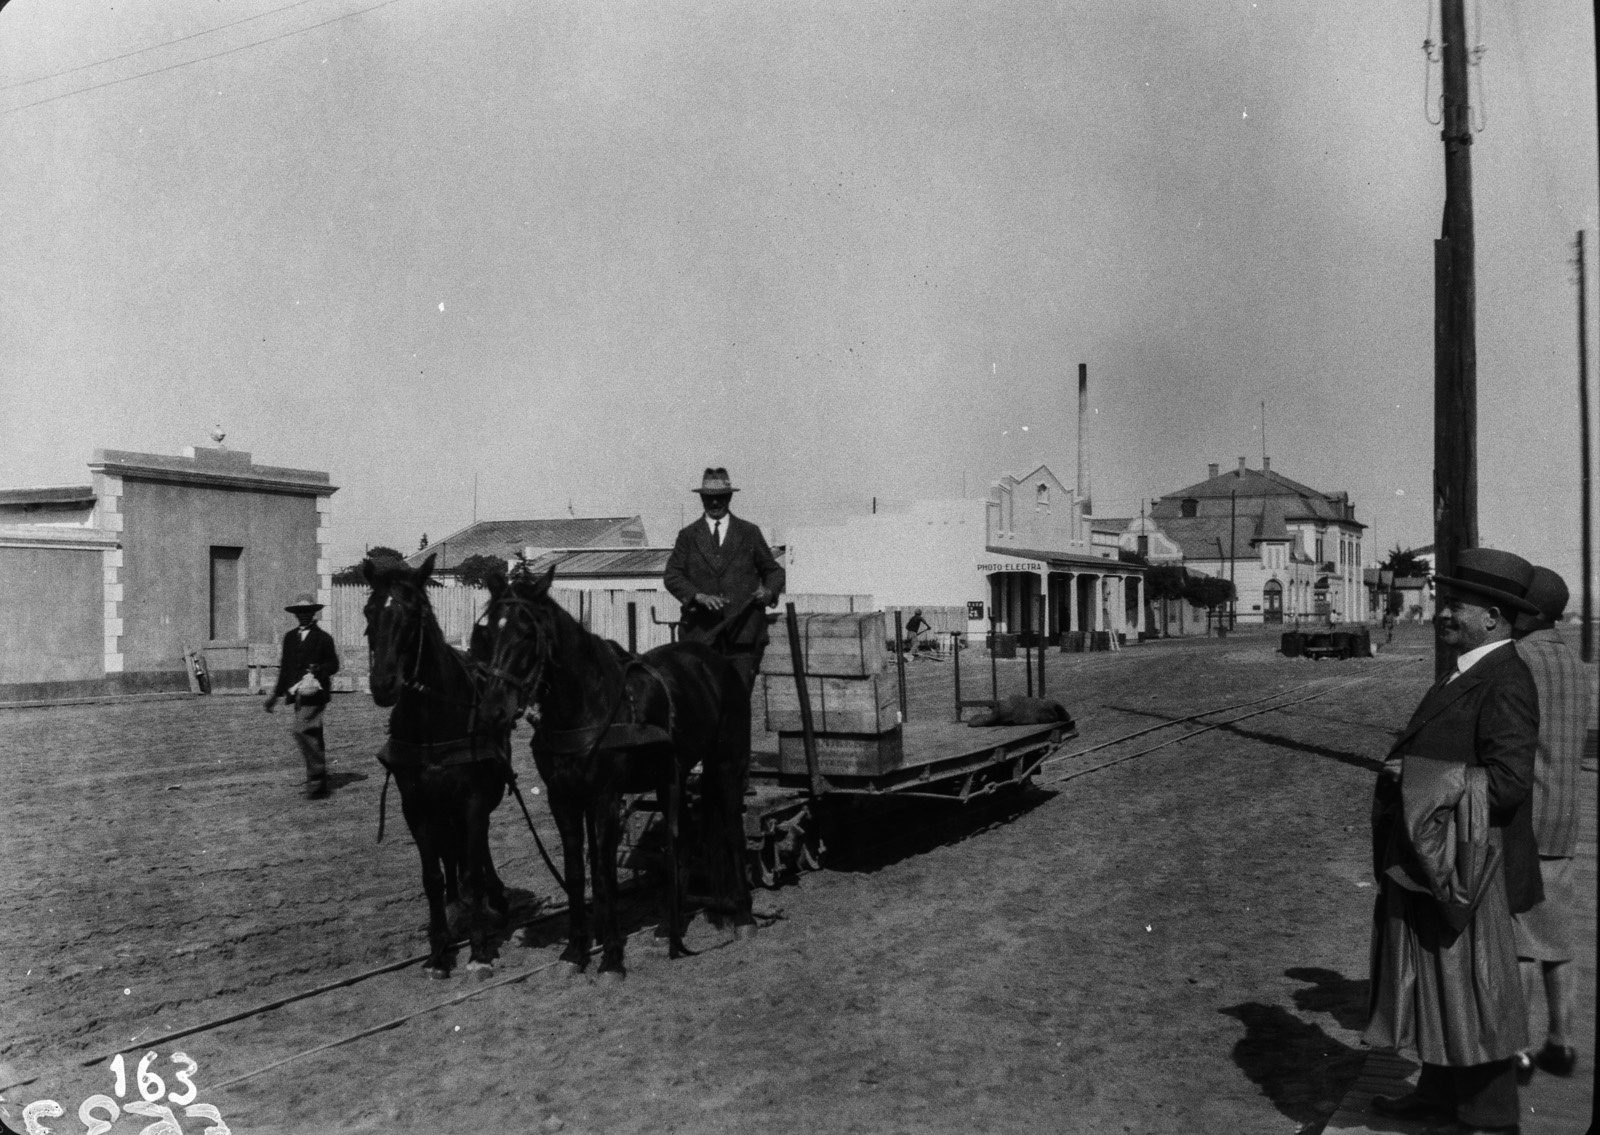 Юго-Западная А́фрика. Свакопмунд. Вид конного автомобиля на улице